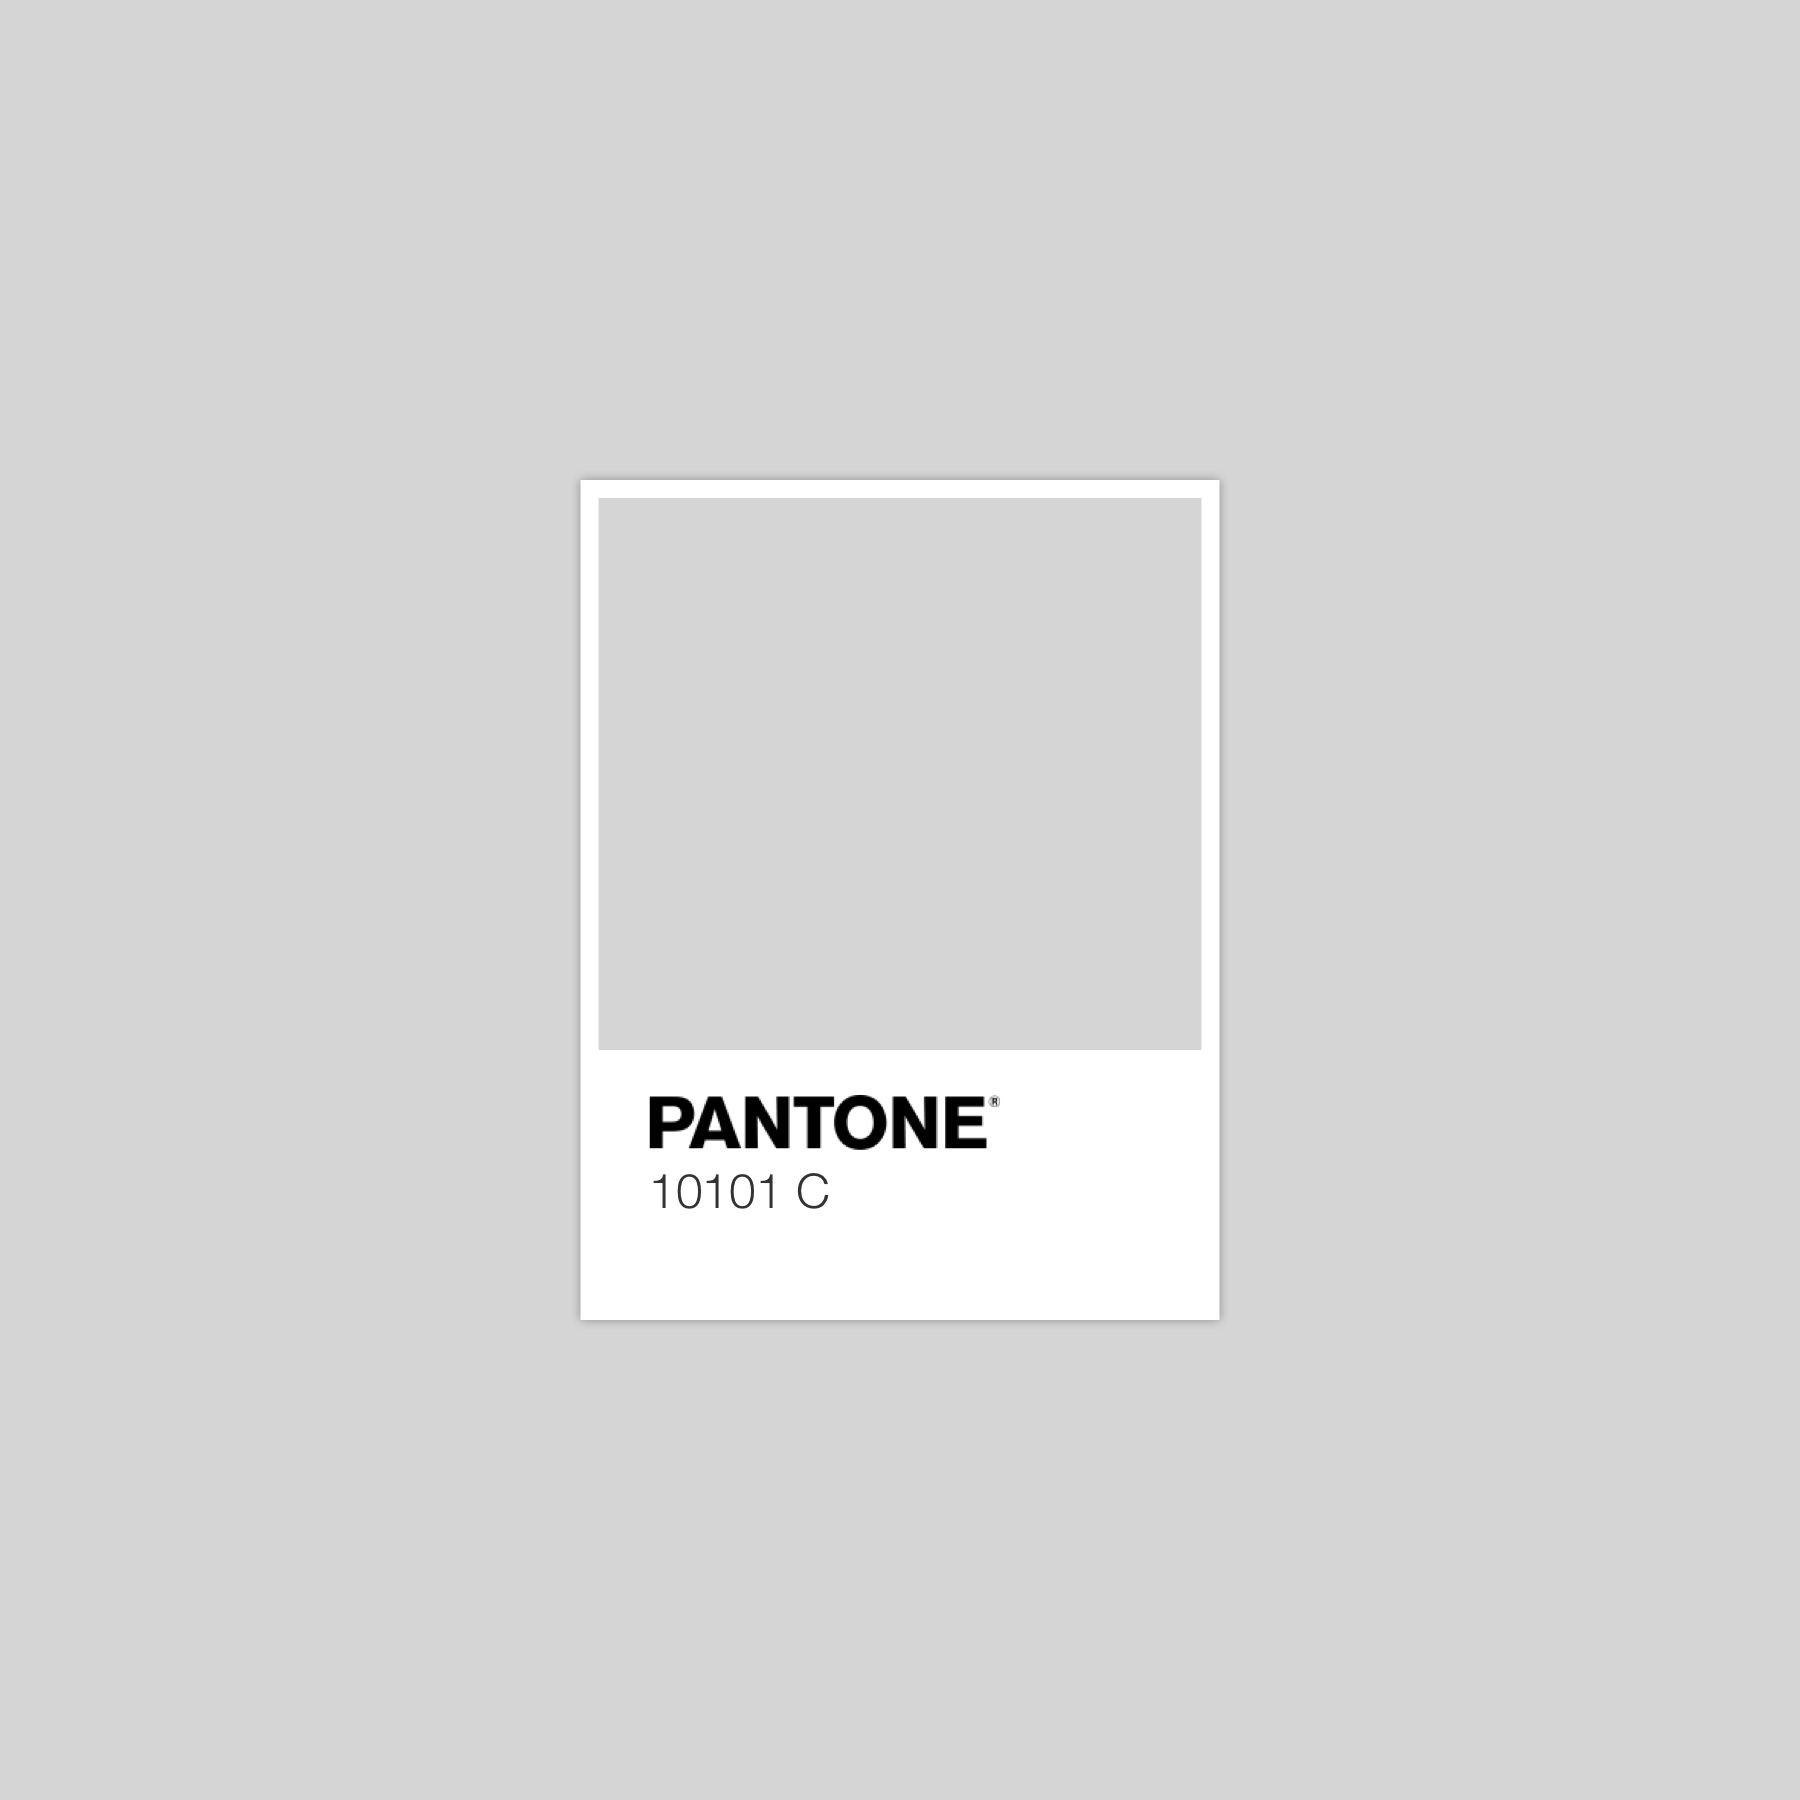 Pin By Rachel Ramsower On Fpd Project Pantone Colour Palettes Pantone Color Beige Color Palette